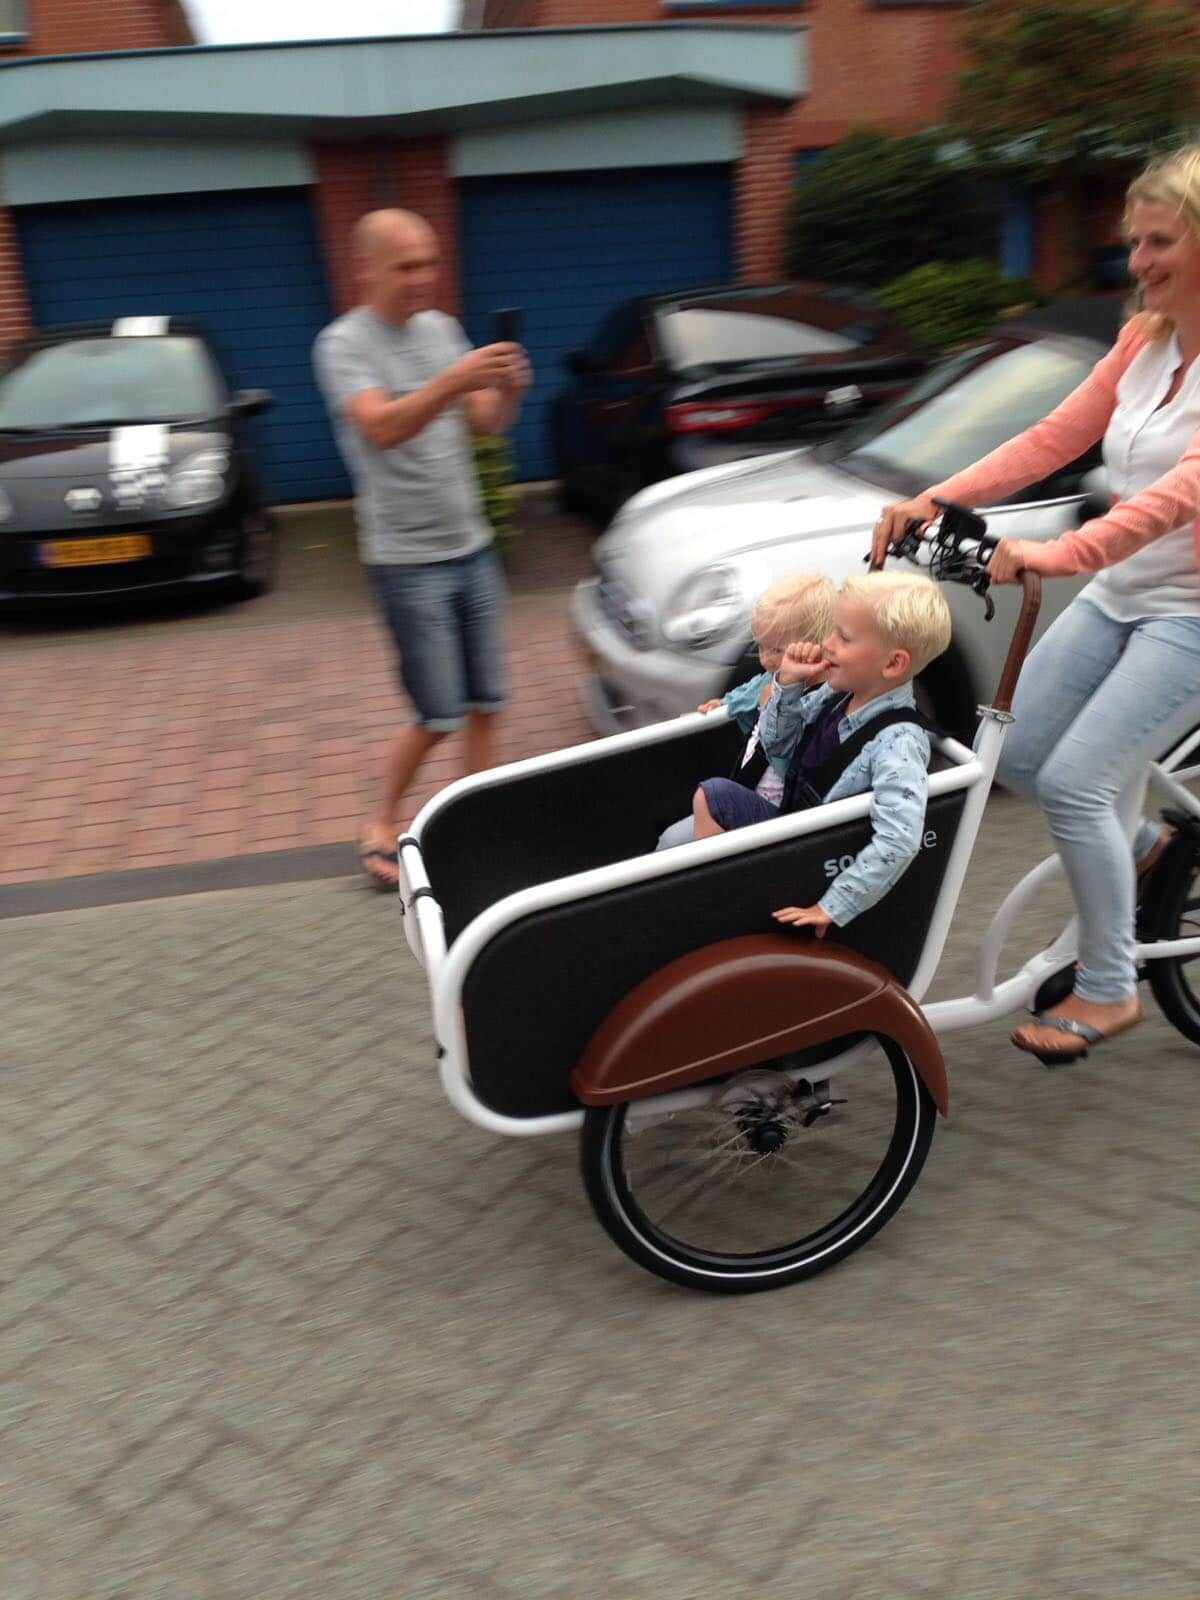 Ervaring soci.bike ambassadeur Sarah Coster-Apeldoorn